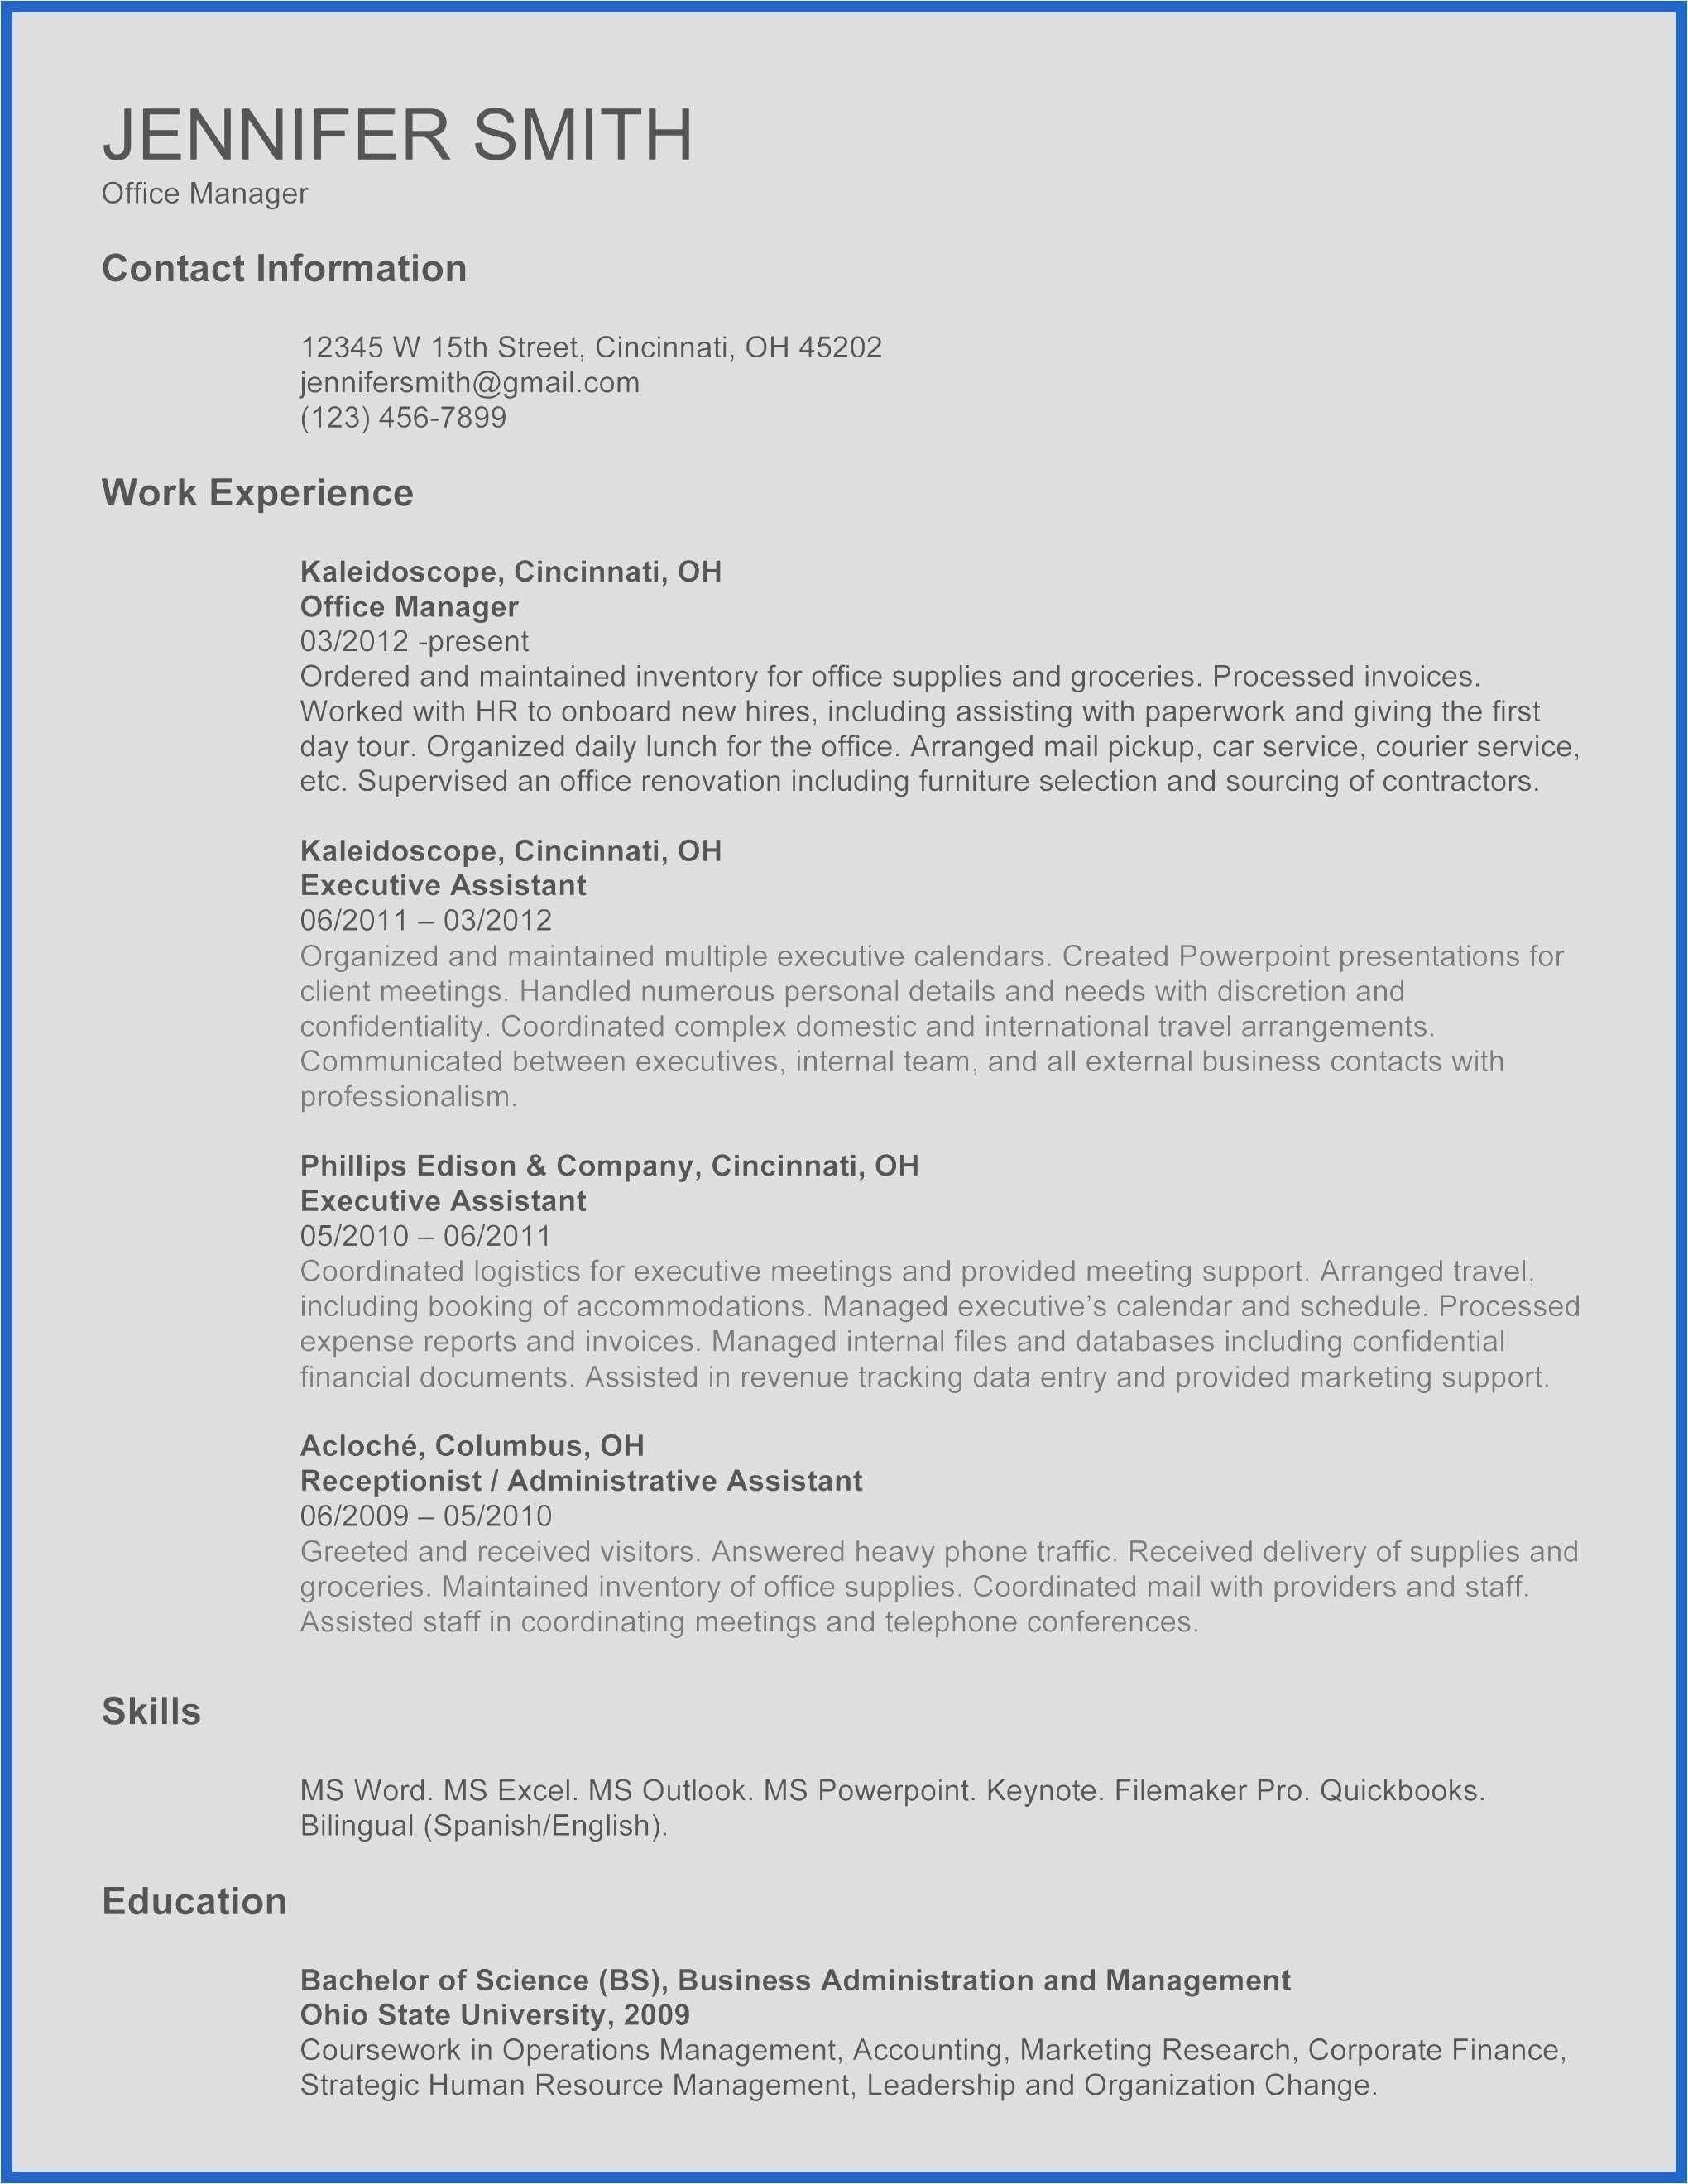 Lebenslauf Vorlage Libreoffice Word 2010 Templates Free Cv Layout Template Word New Cv Templates 0d